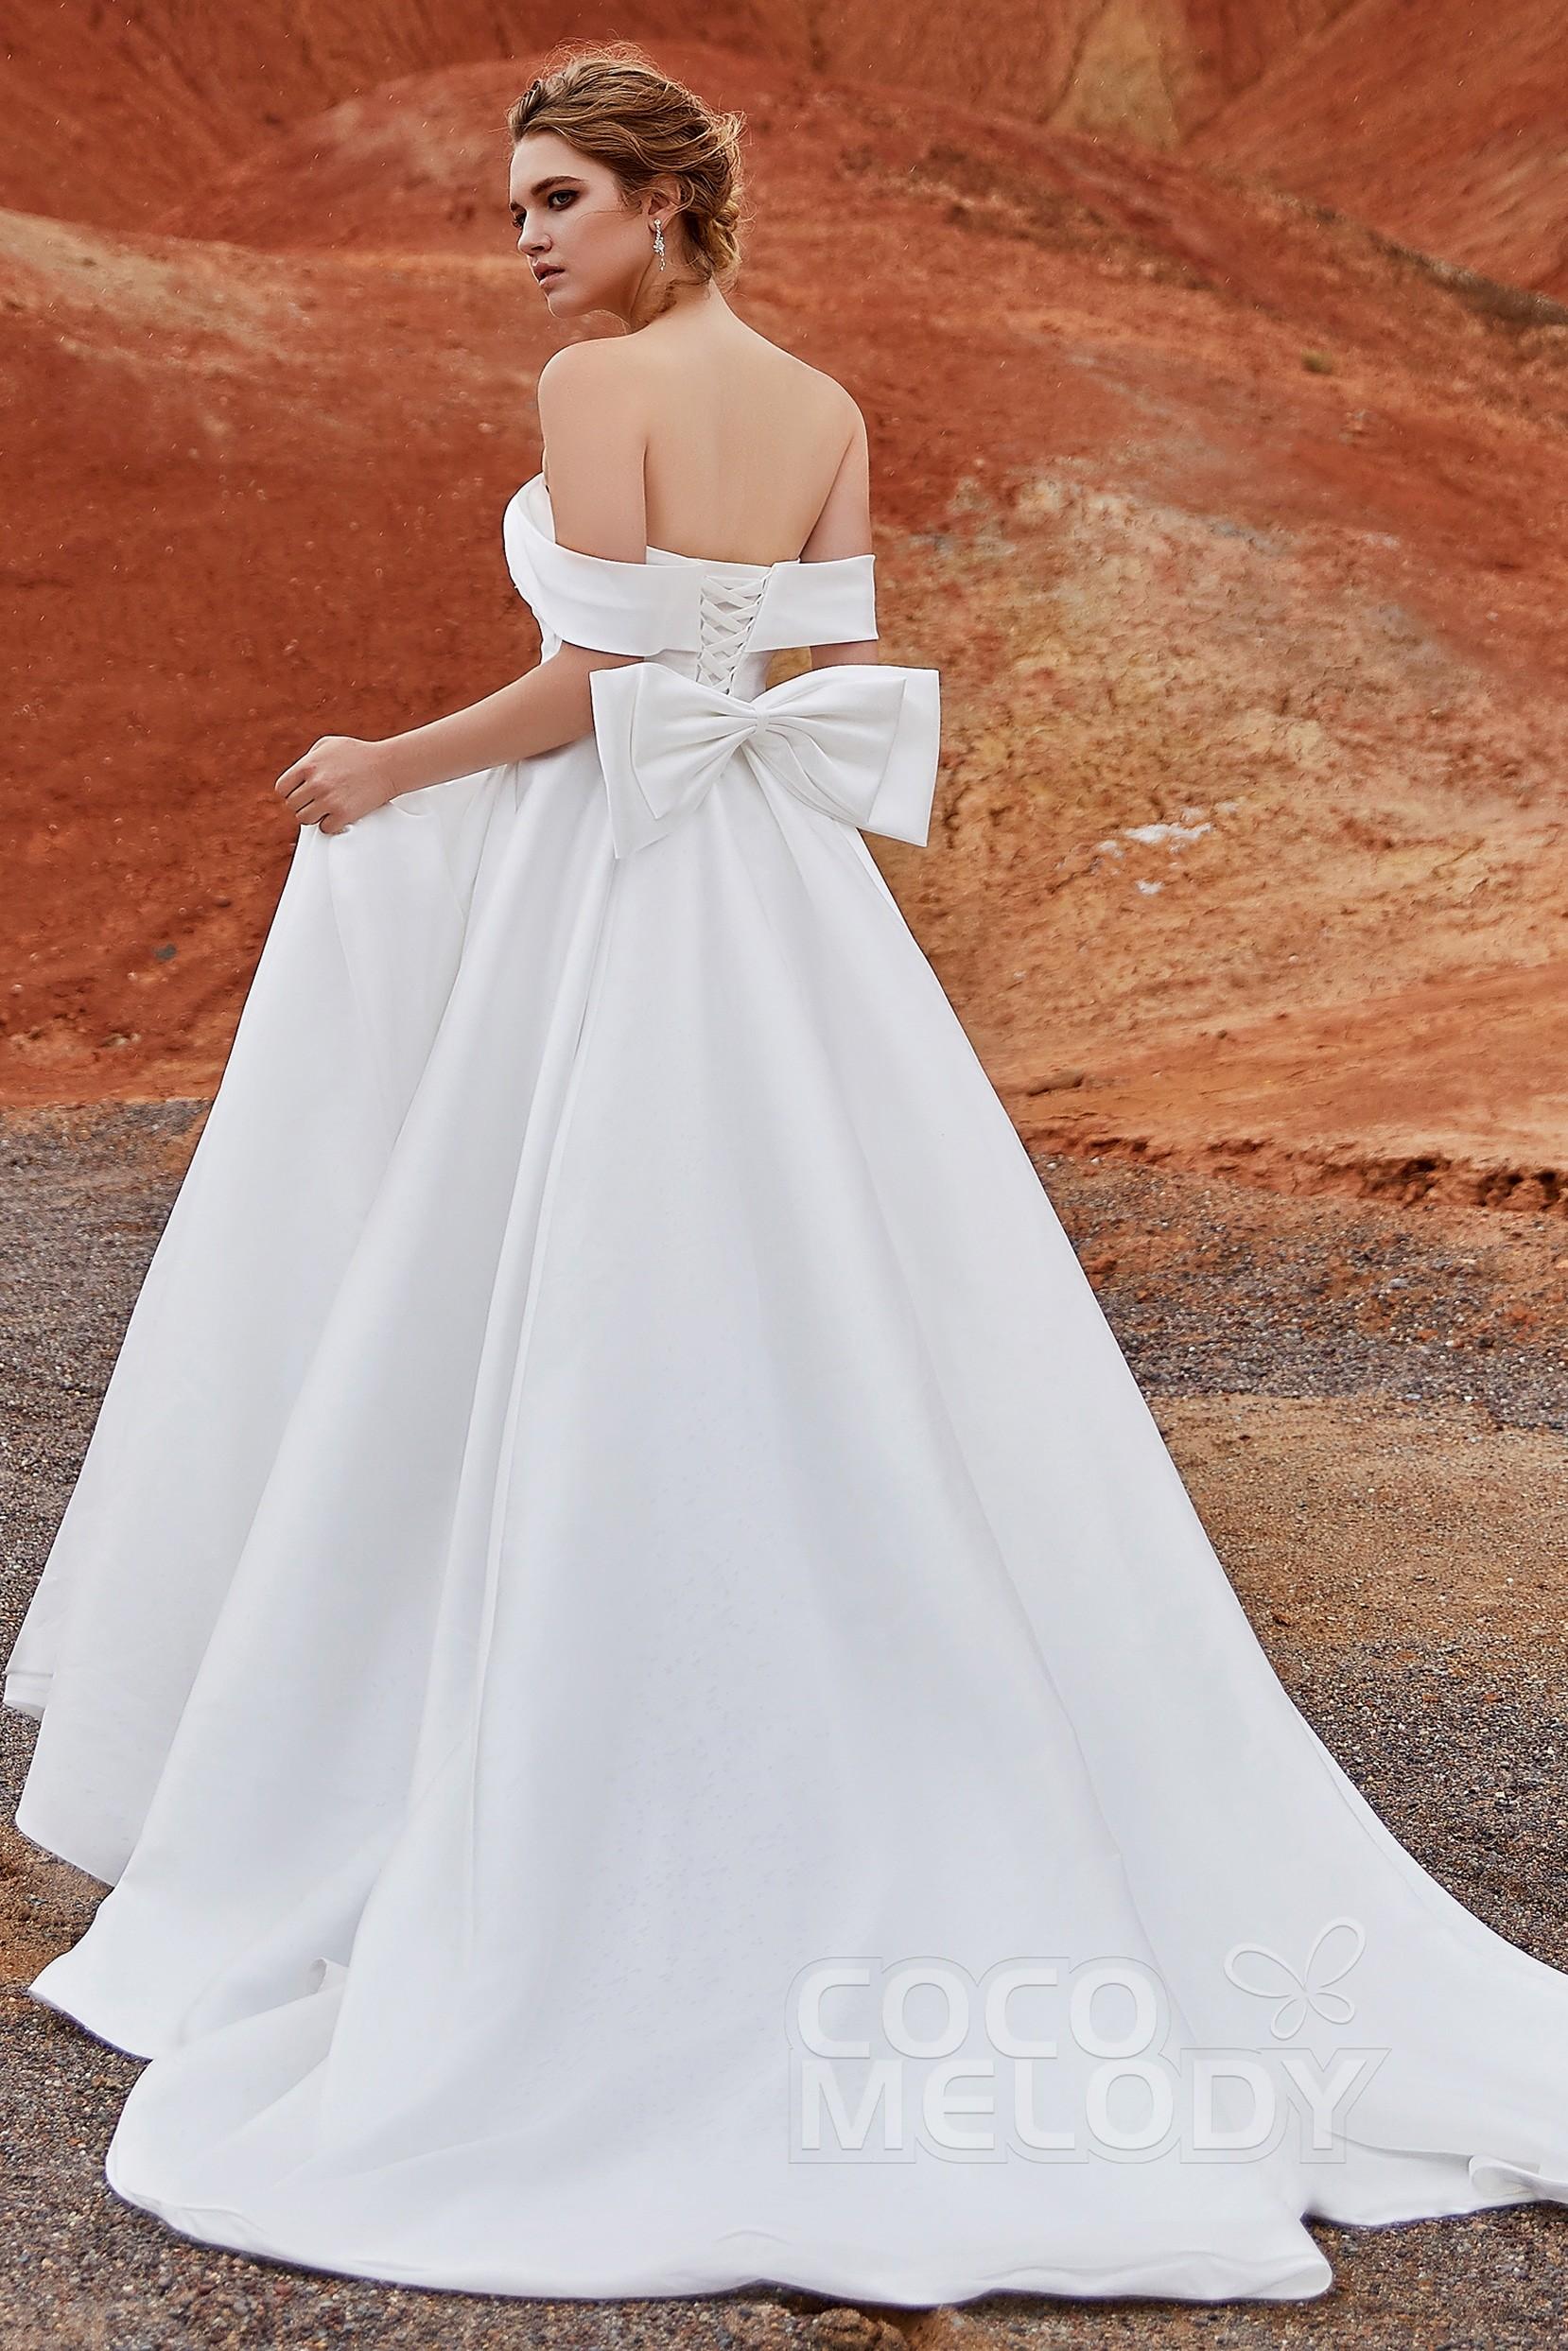 wwww.santabarbarawedding.com | COCOMELODY | A-Line Court Train Silk Satin Wedding Dress